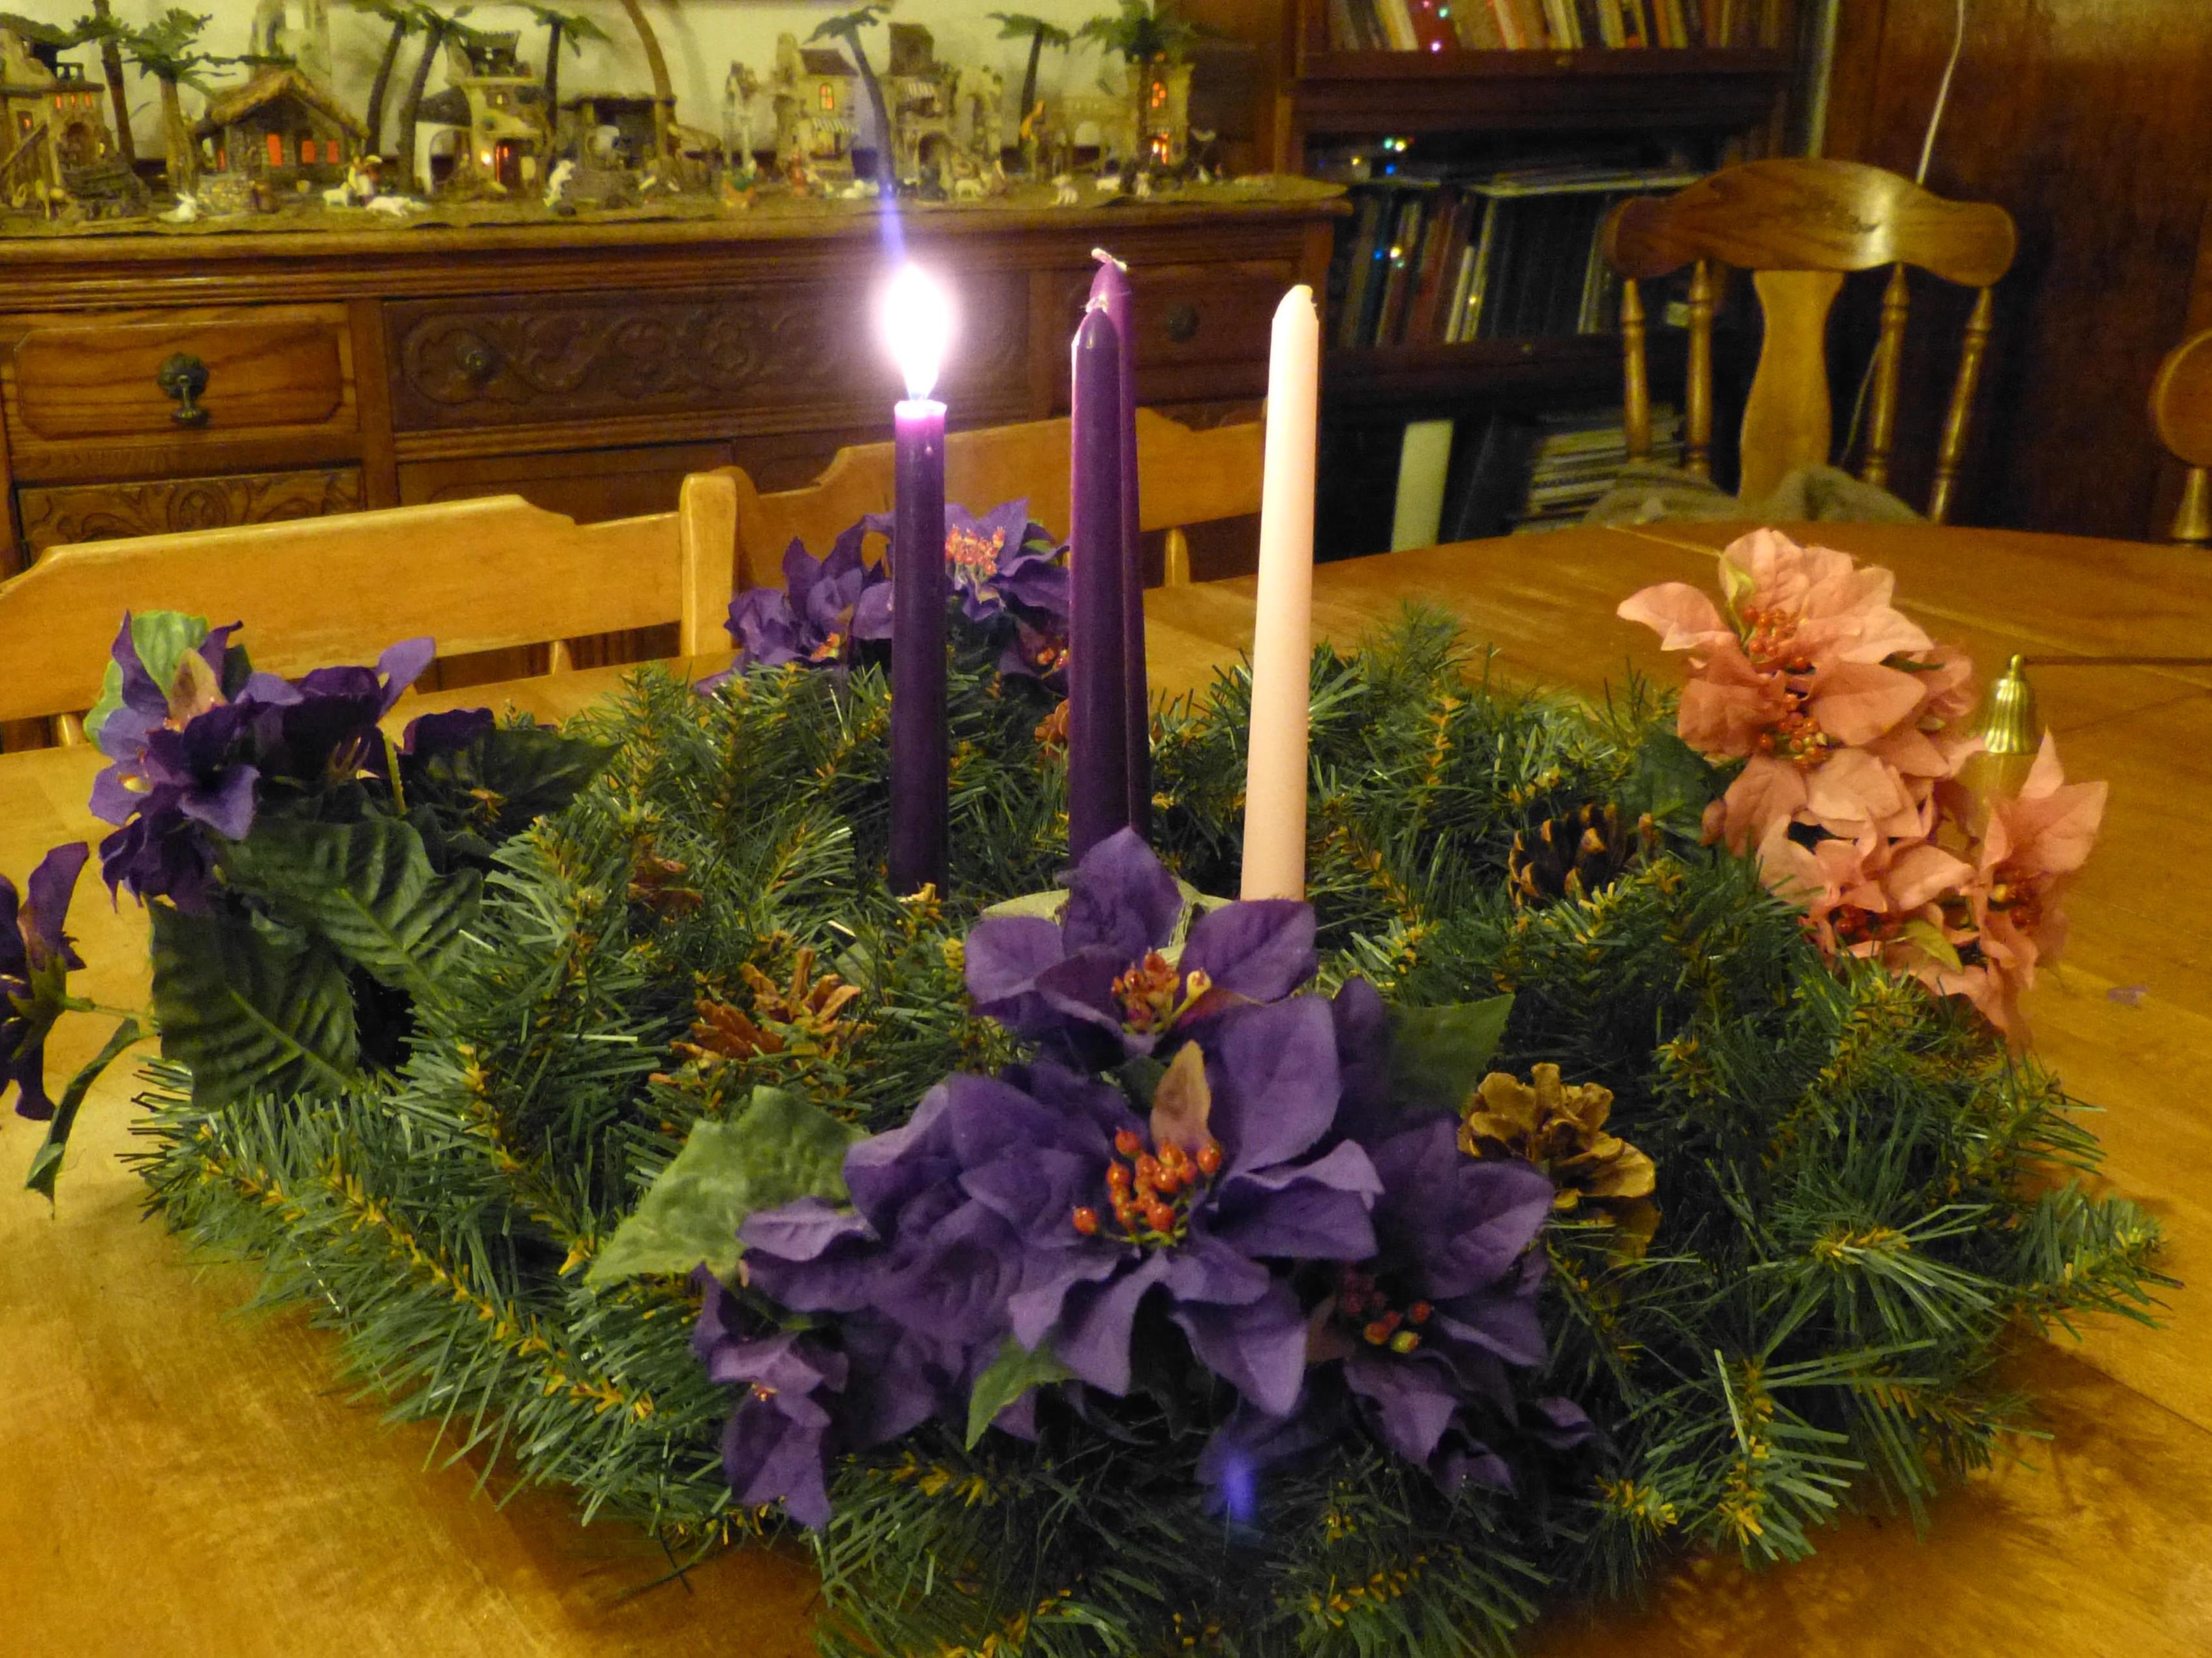 Roman Catholic Advent Season: Four Joyful Weeks Before Christmas!.